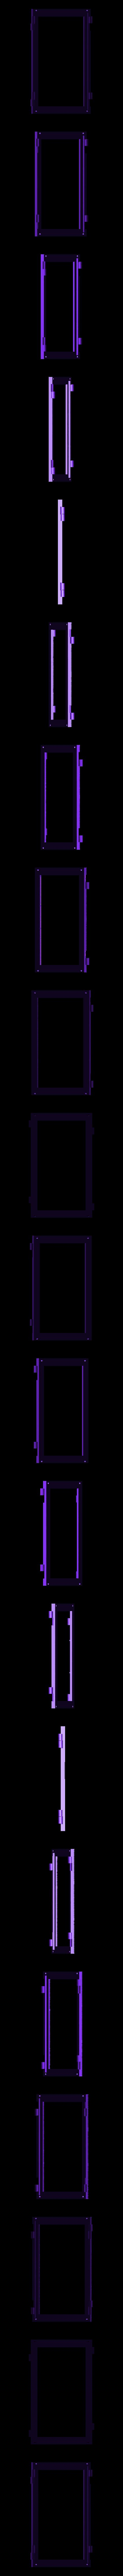 zonnenpaneel_frame_86x150x3_1.stl Download free STL file Solar Panel Holder • Object to 3D print, Job